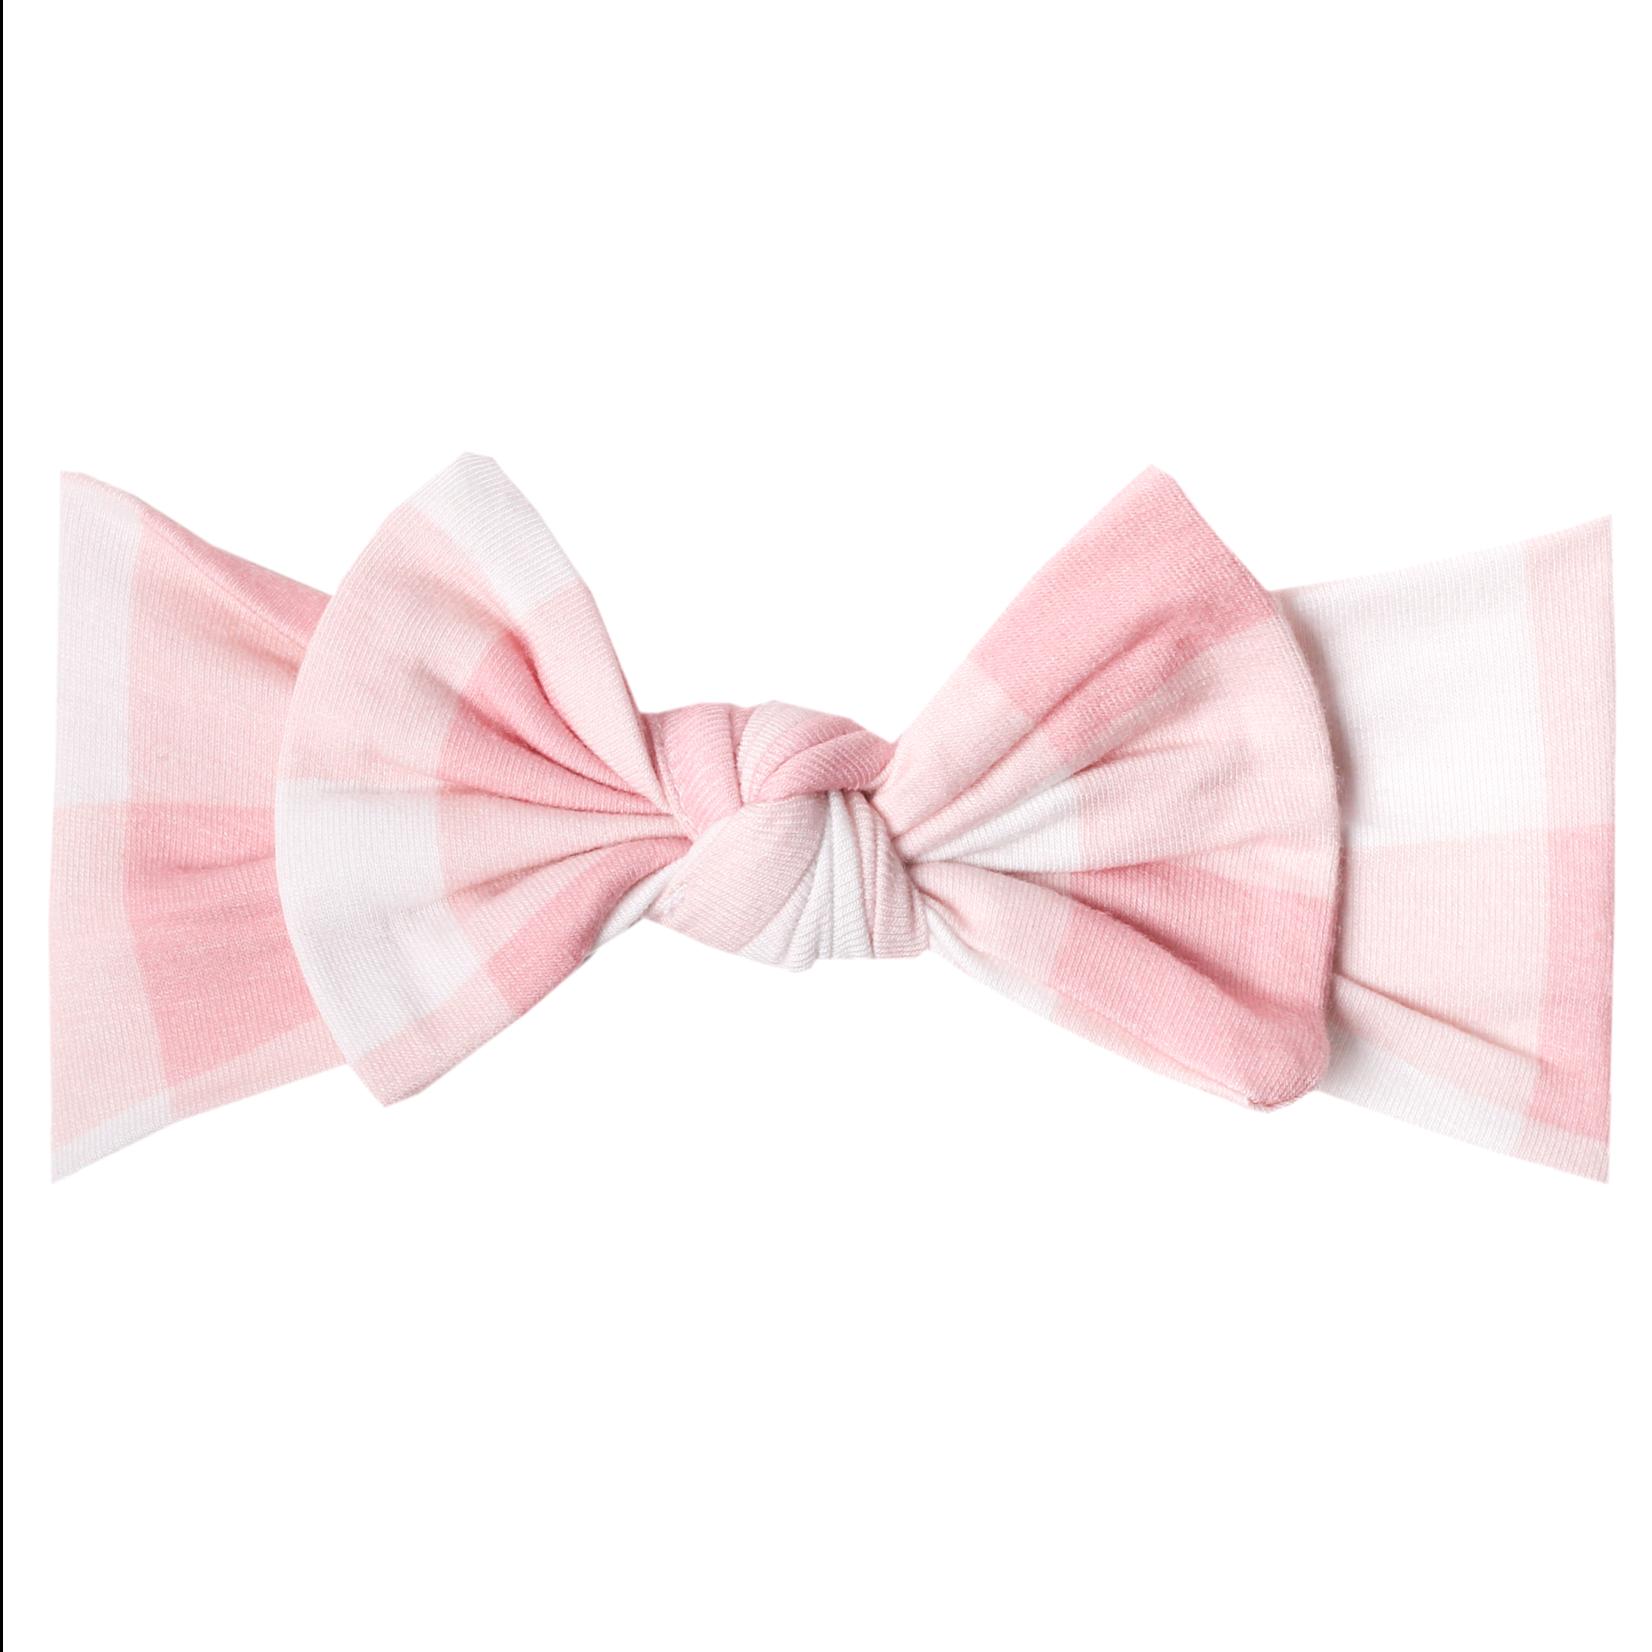 Copper Pearl Baby: Knit Headbands